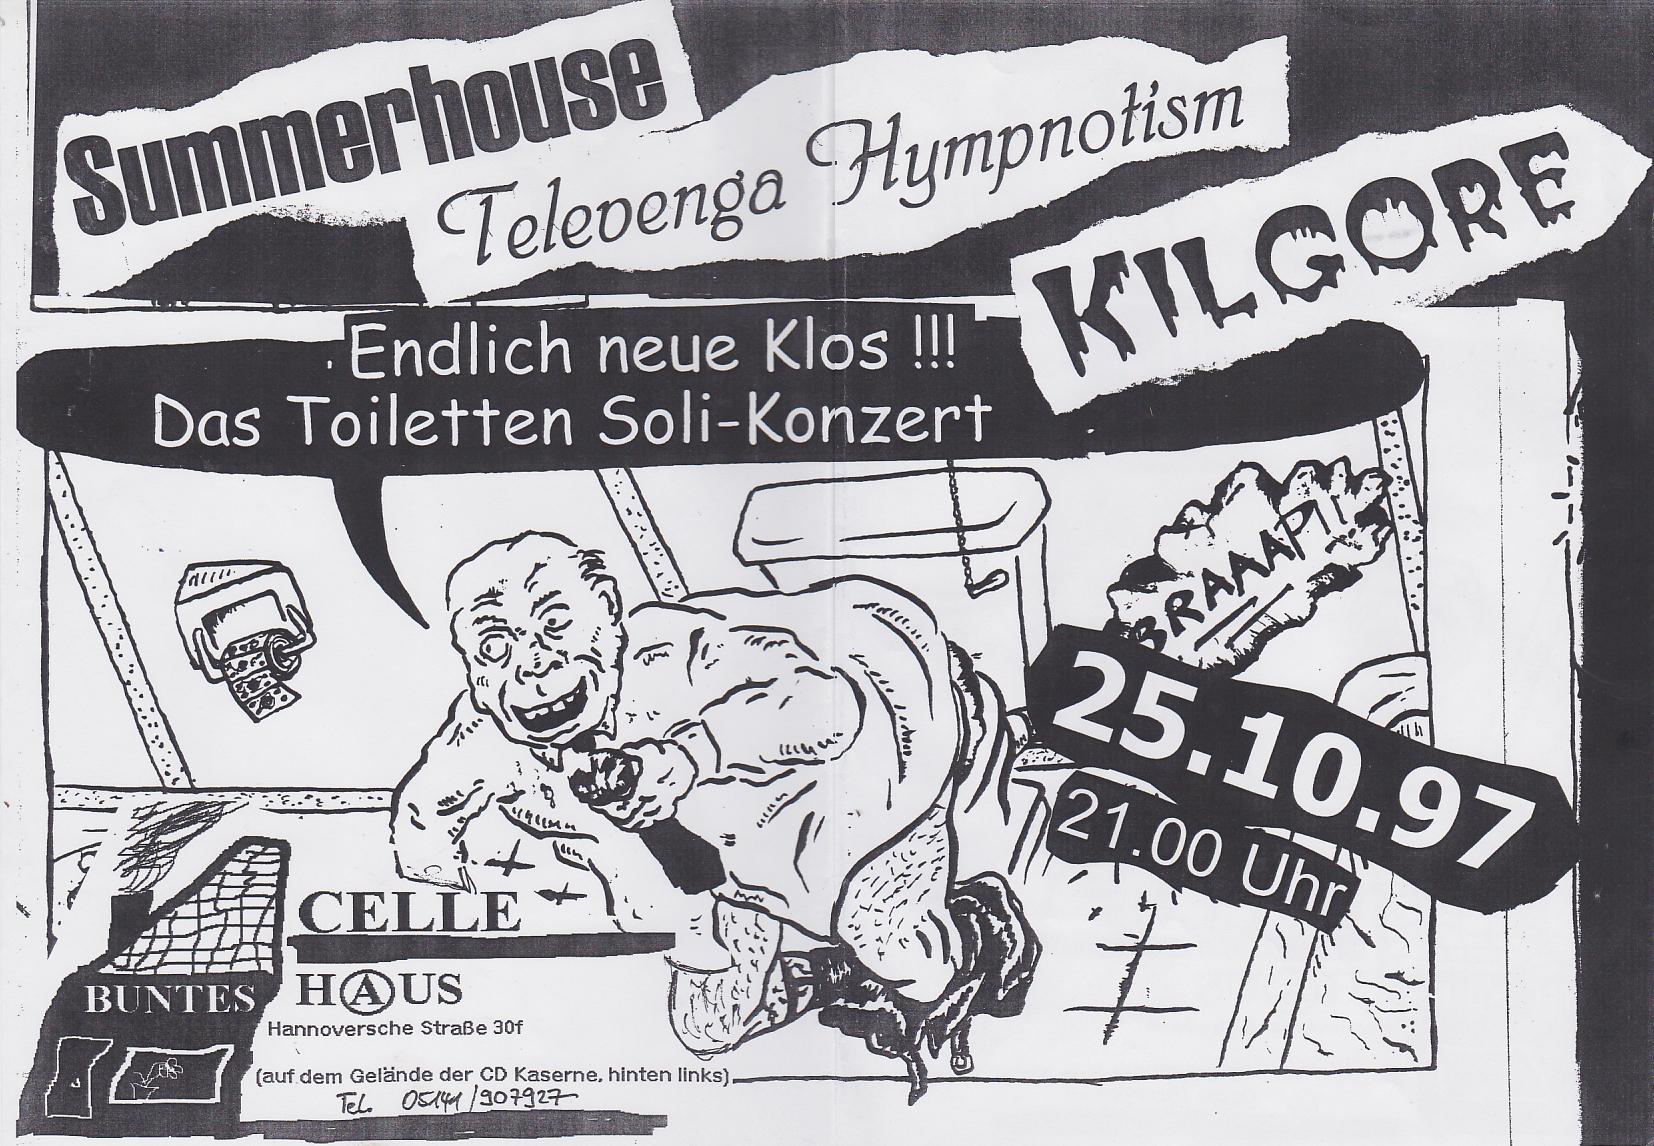 Www Bunteshaus De 25 10 1997 Konzert Kilgore Televenga Hympnotism